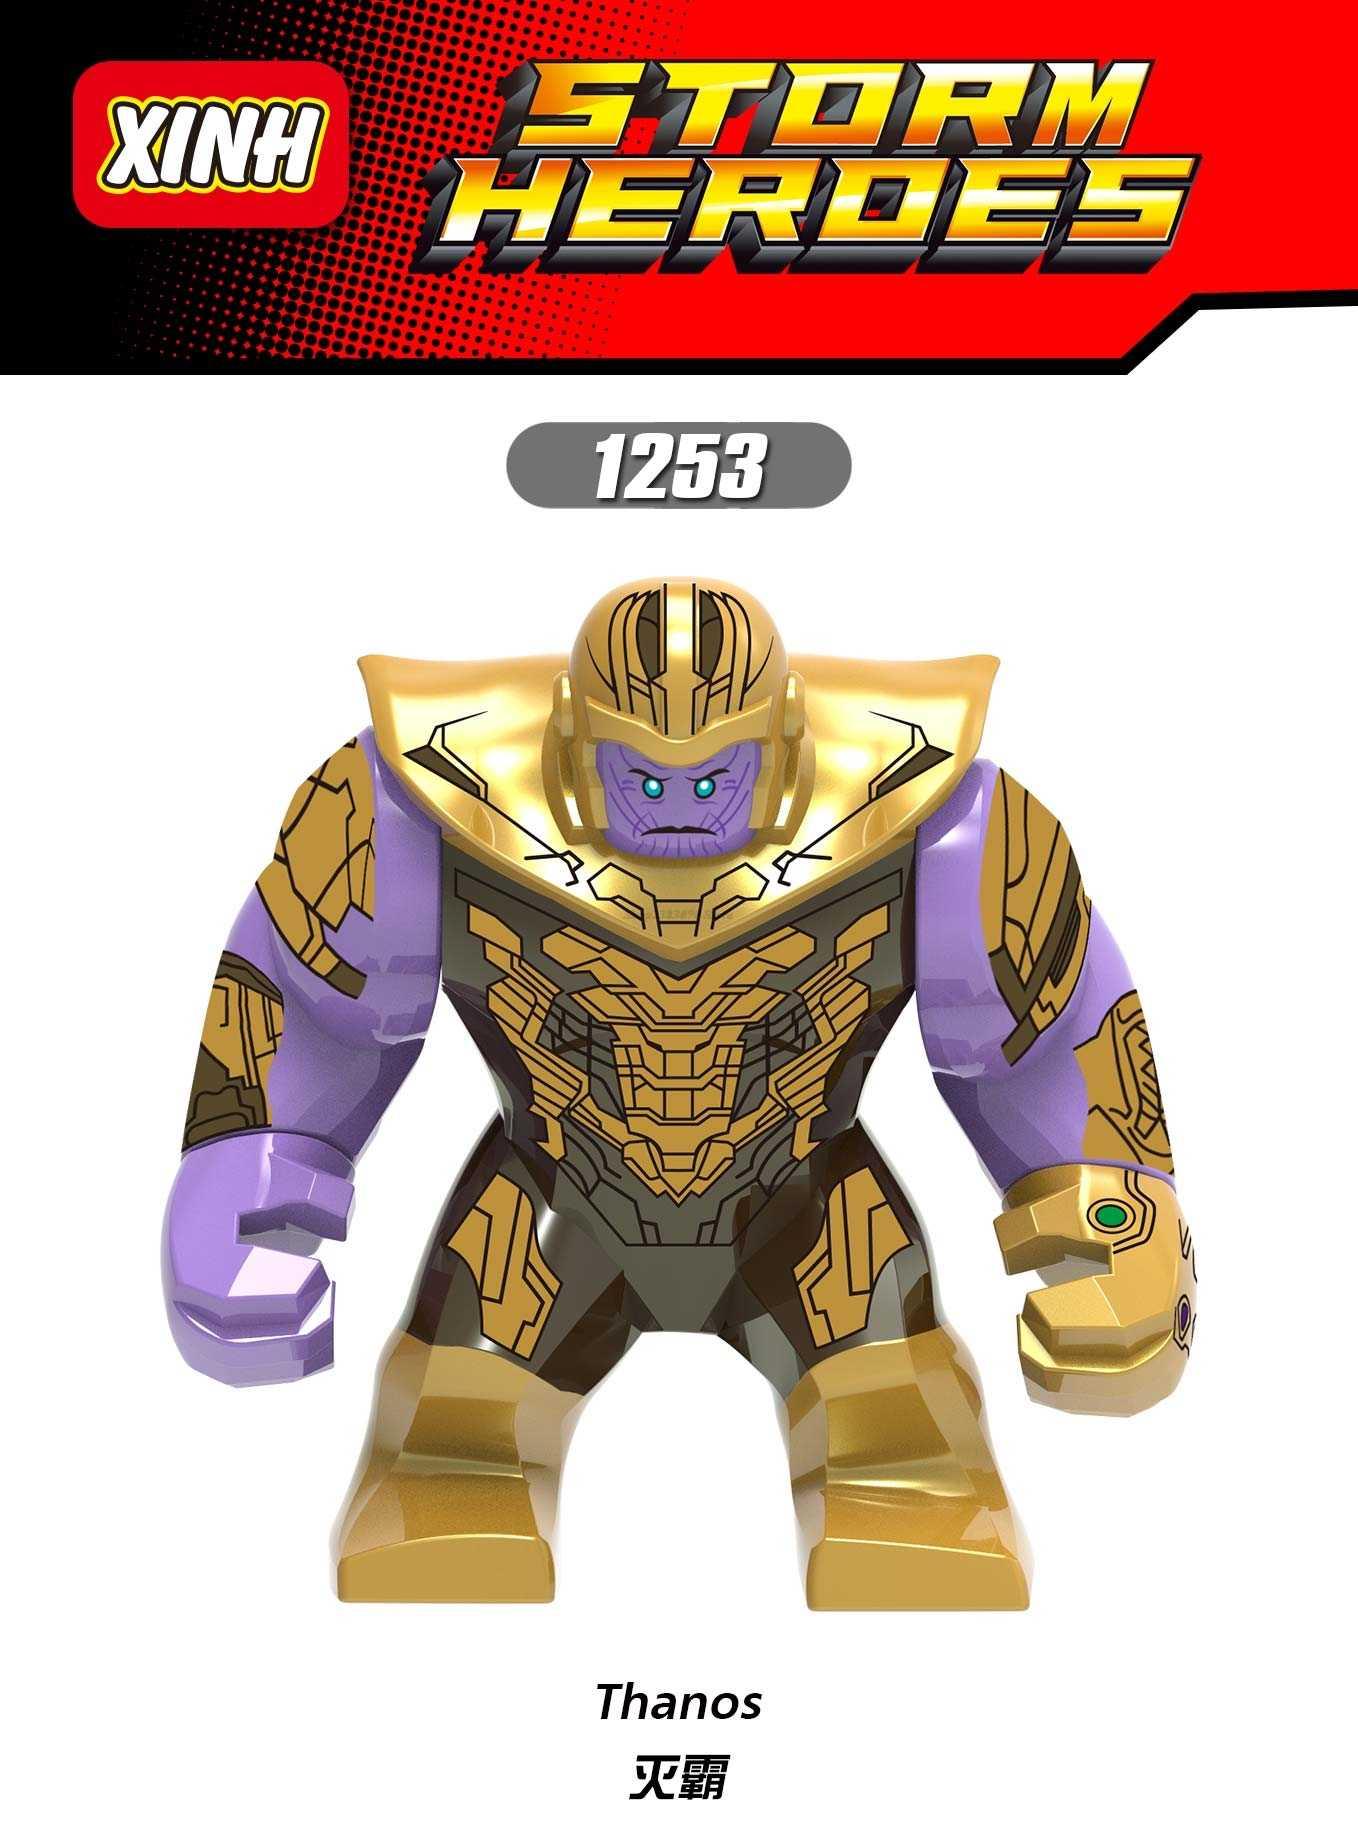 Legoing Marvel Hulk Thanos Super Heroes Batman Spider man Iron Man Avengers 4 Figures Captain America Building Blocks Toys Gifts